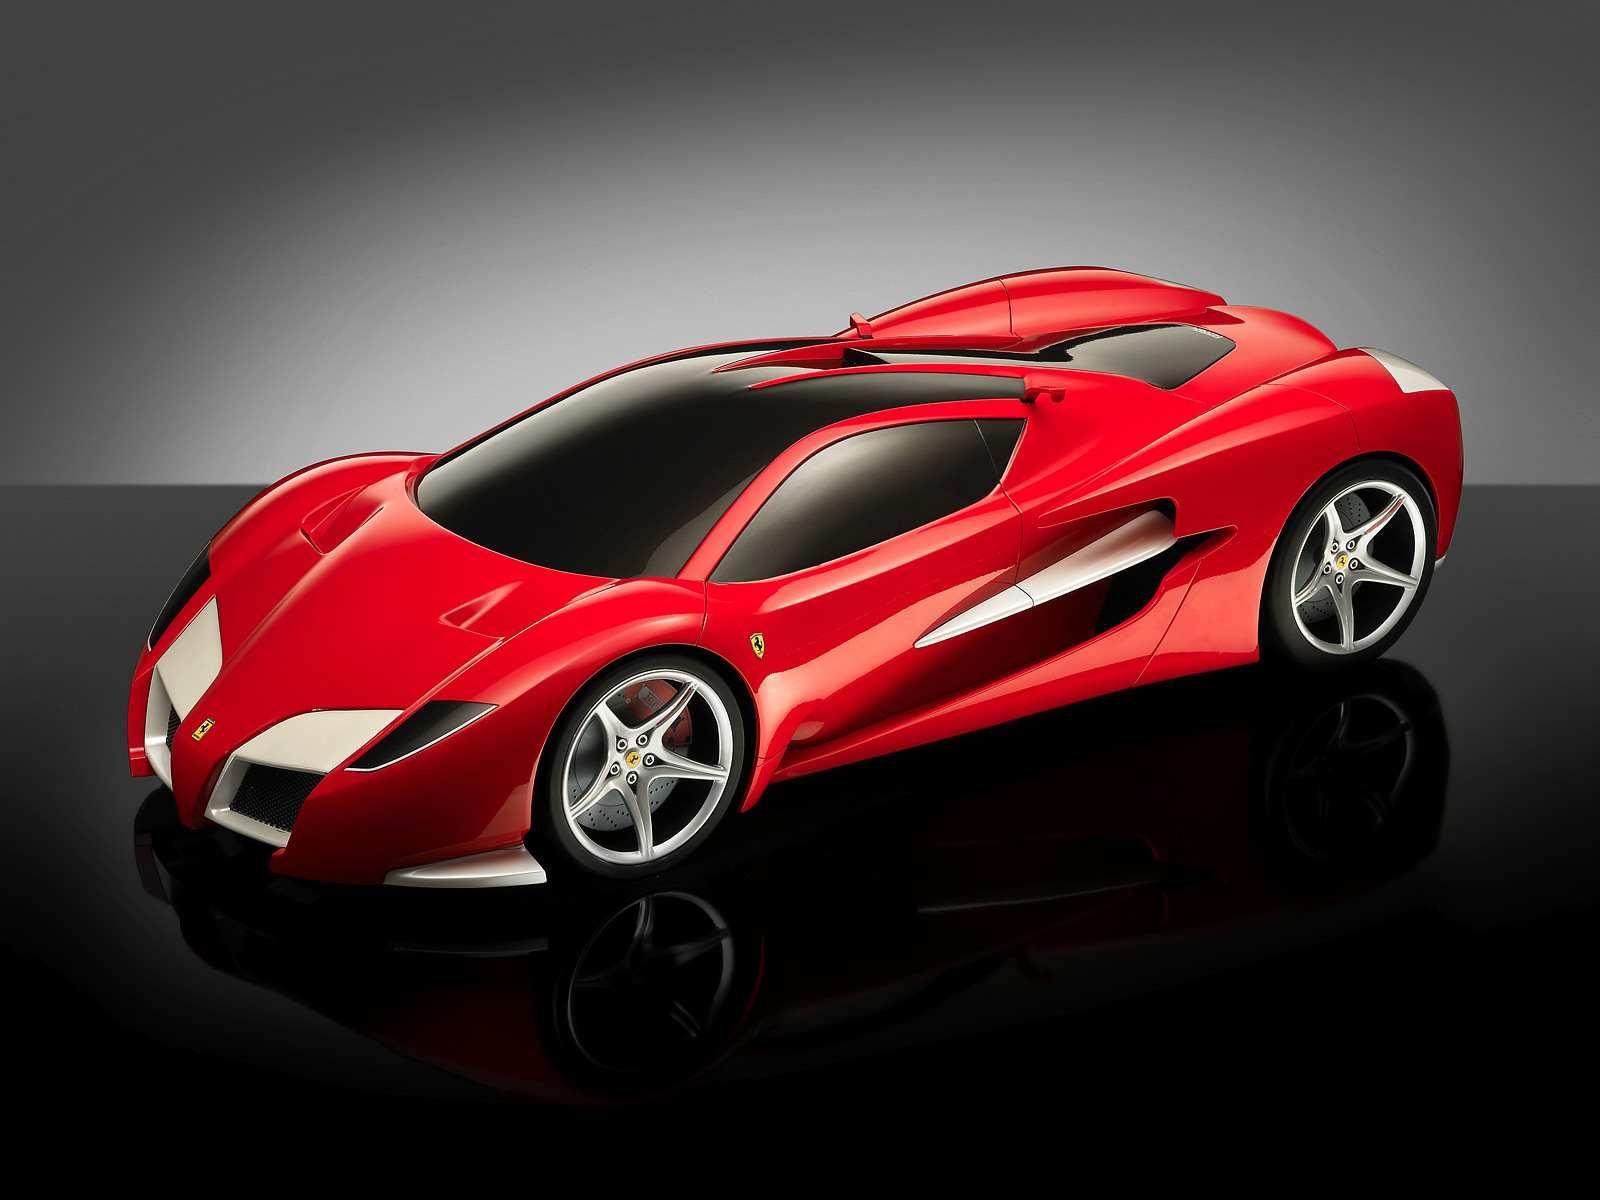 UK Auto Cars Latest Models Ferrari Cars Wallpapers 2011 1600x1200